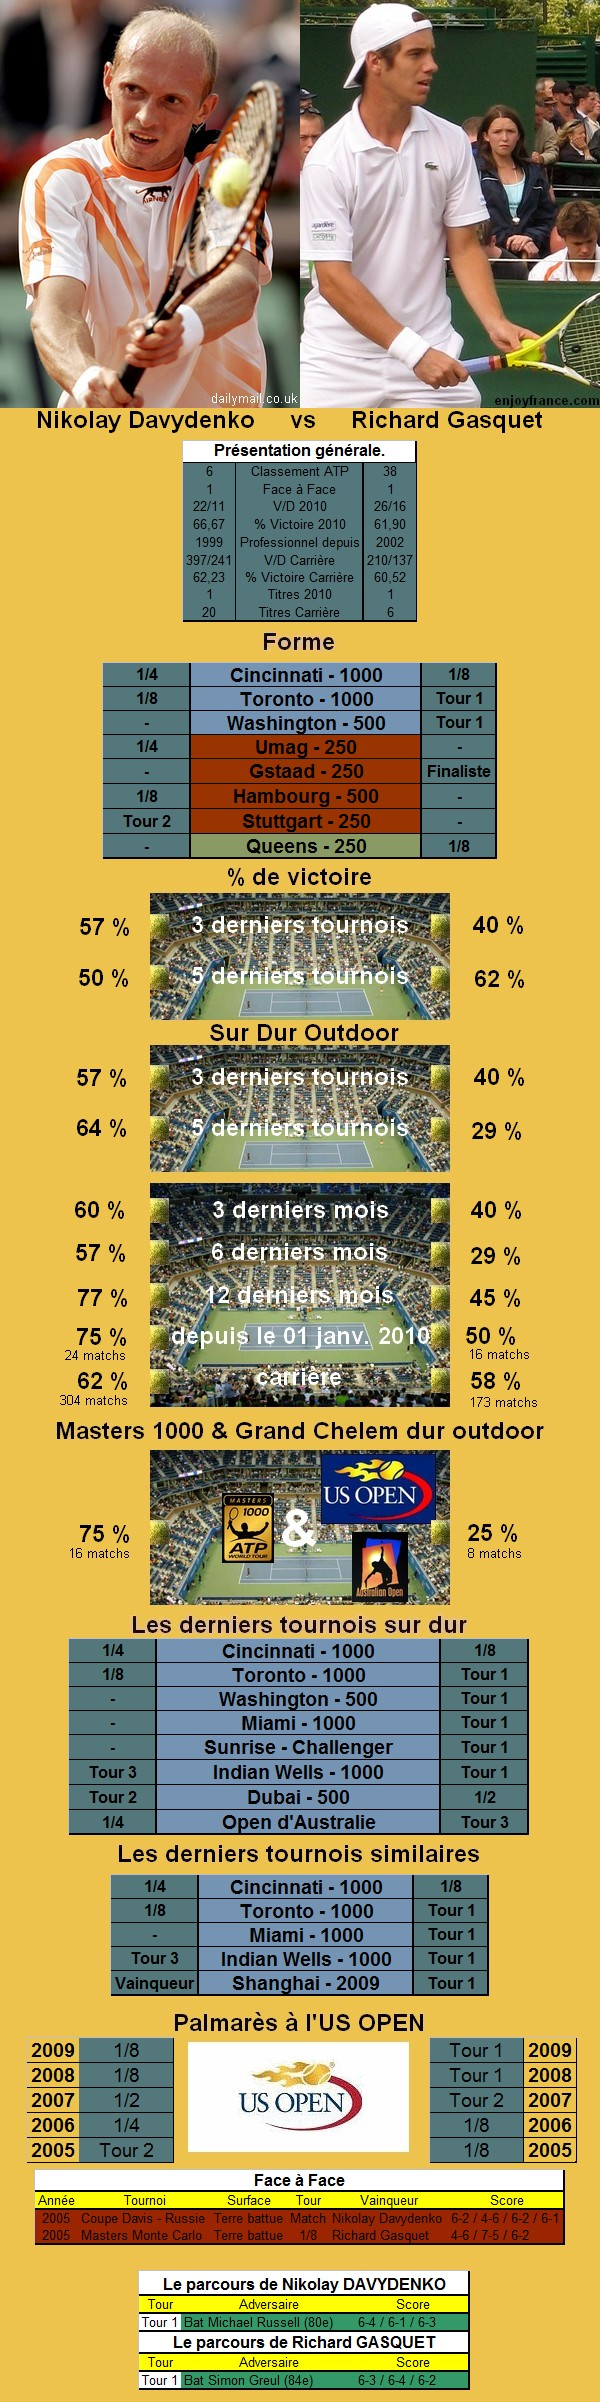 Statistiques tennis de Davydenko contre Gasquet à l'US OPEN